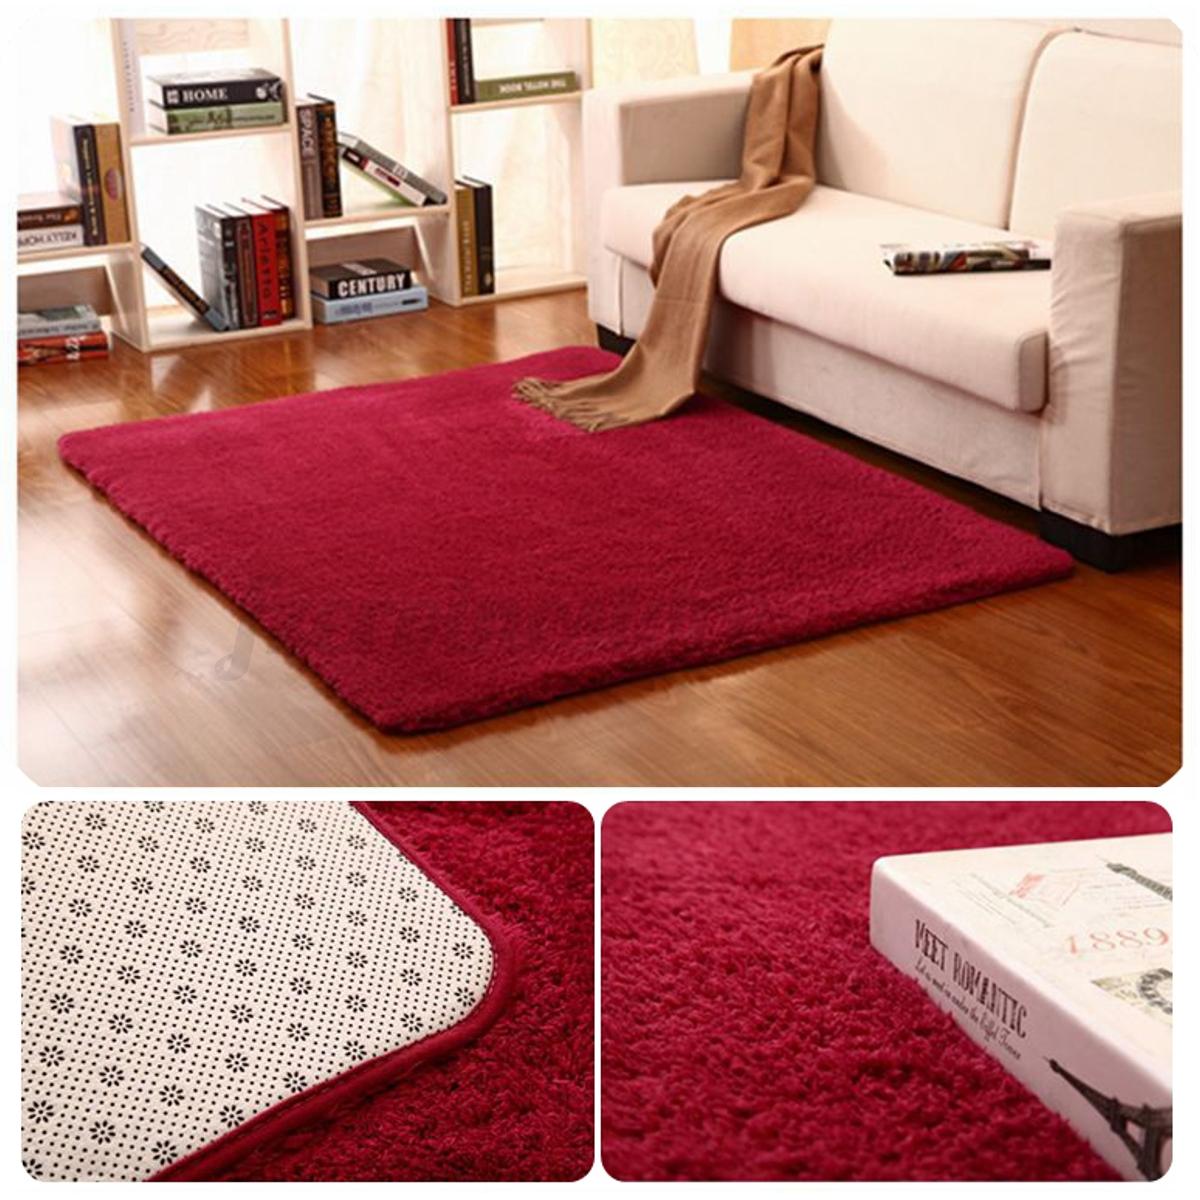 Fluffy rugs anti skid shaggy area rug home bedroom dining - Tappeti da sala ...